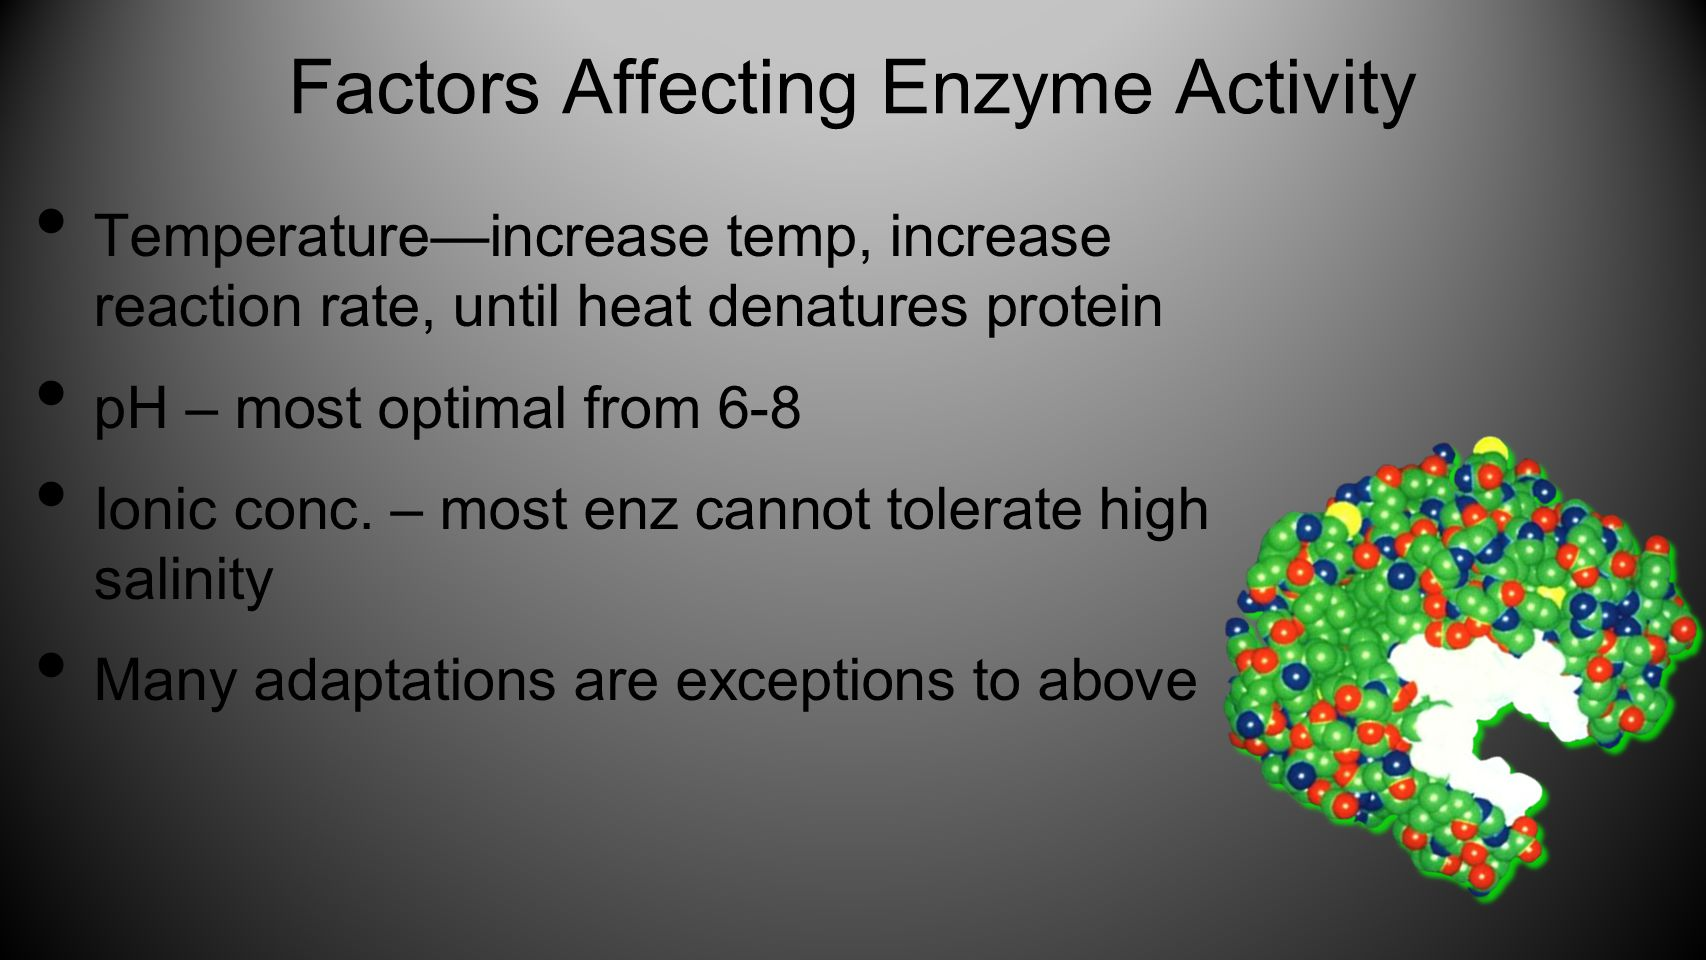 Factors Affecting Enzyme Activity